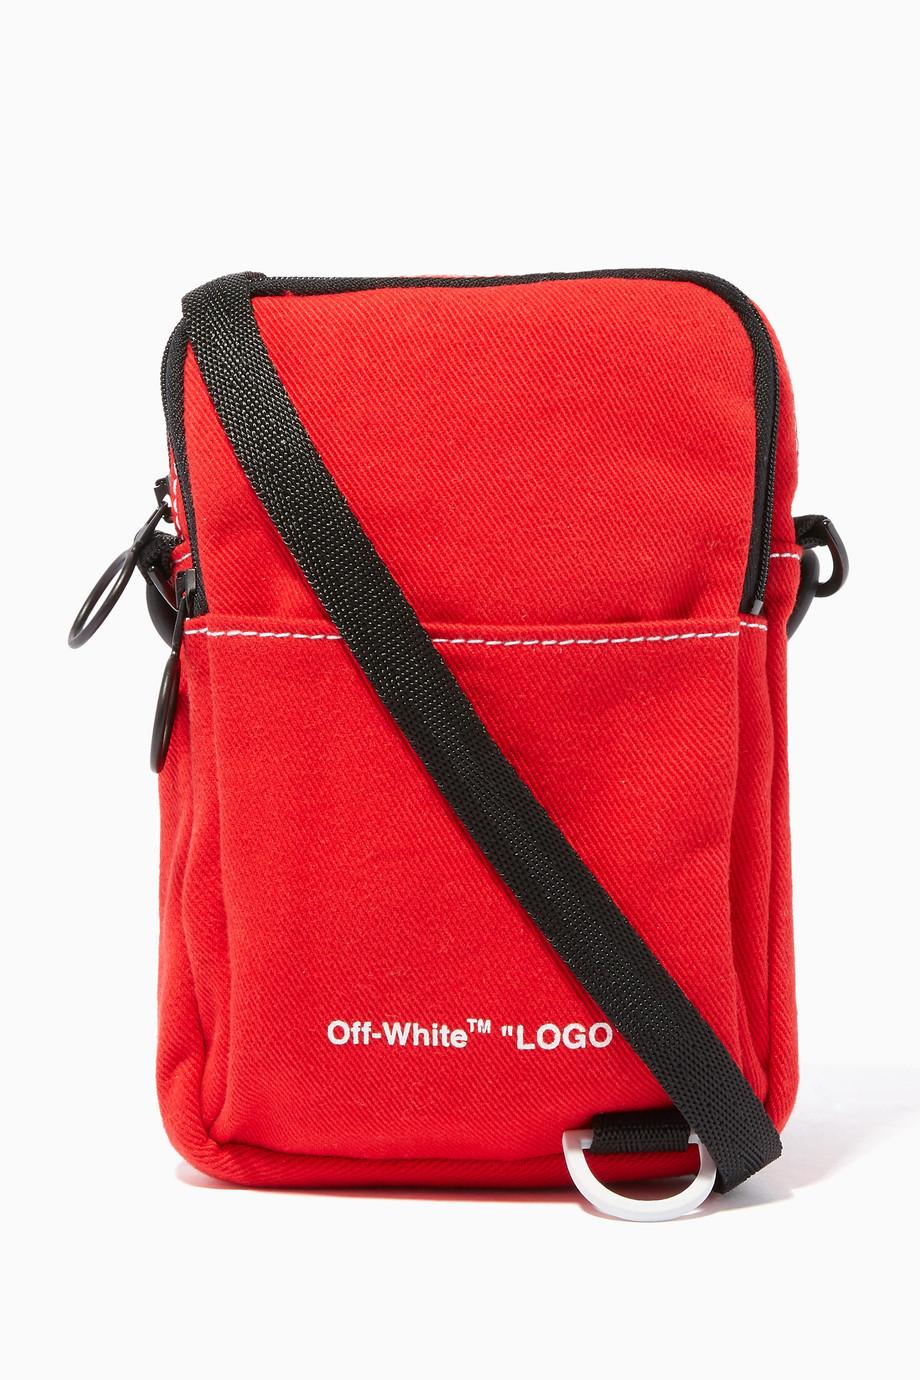 cd52b28f4 Shop Off-White Red Red Denim Hip Bag for Men | Ounass UAE